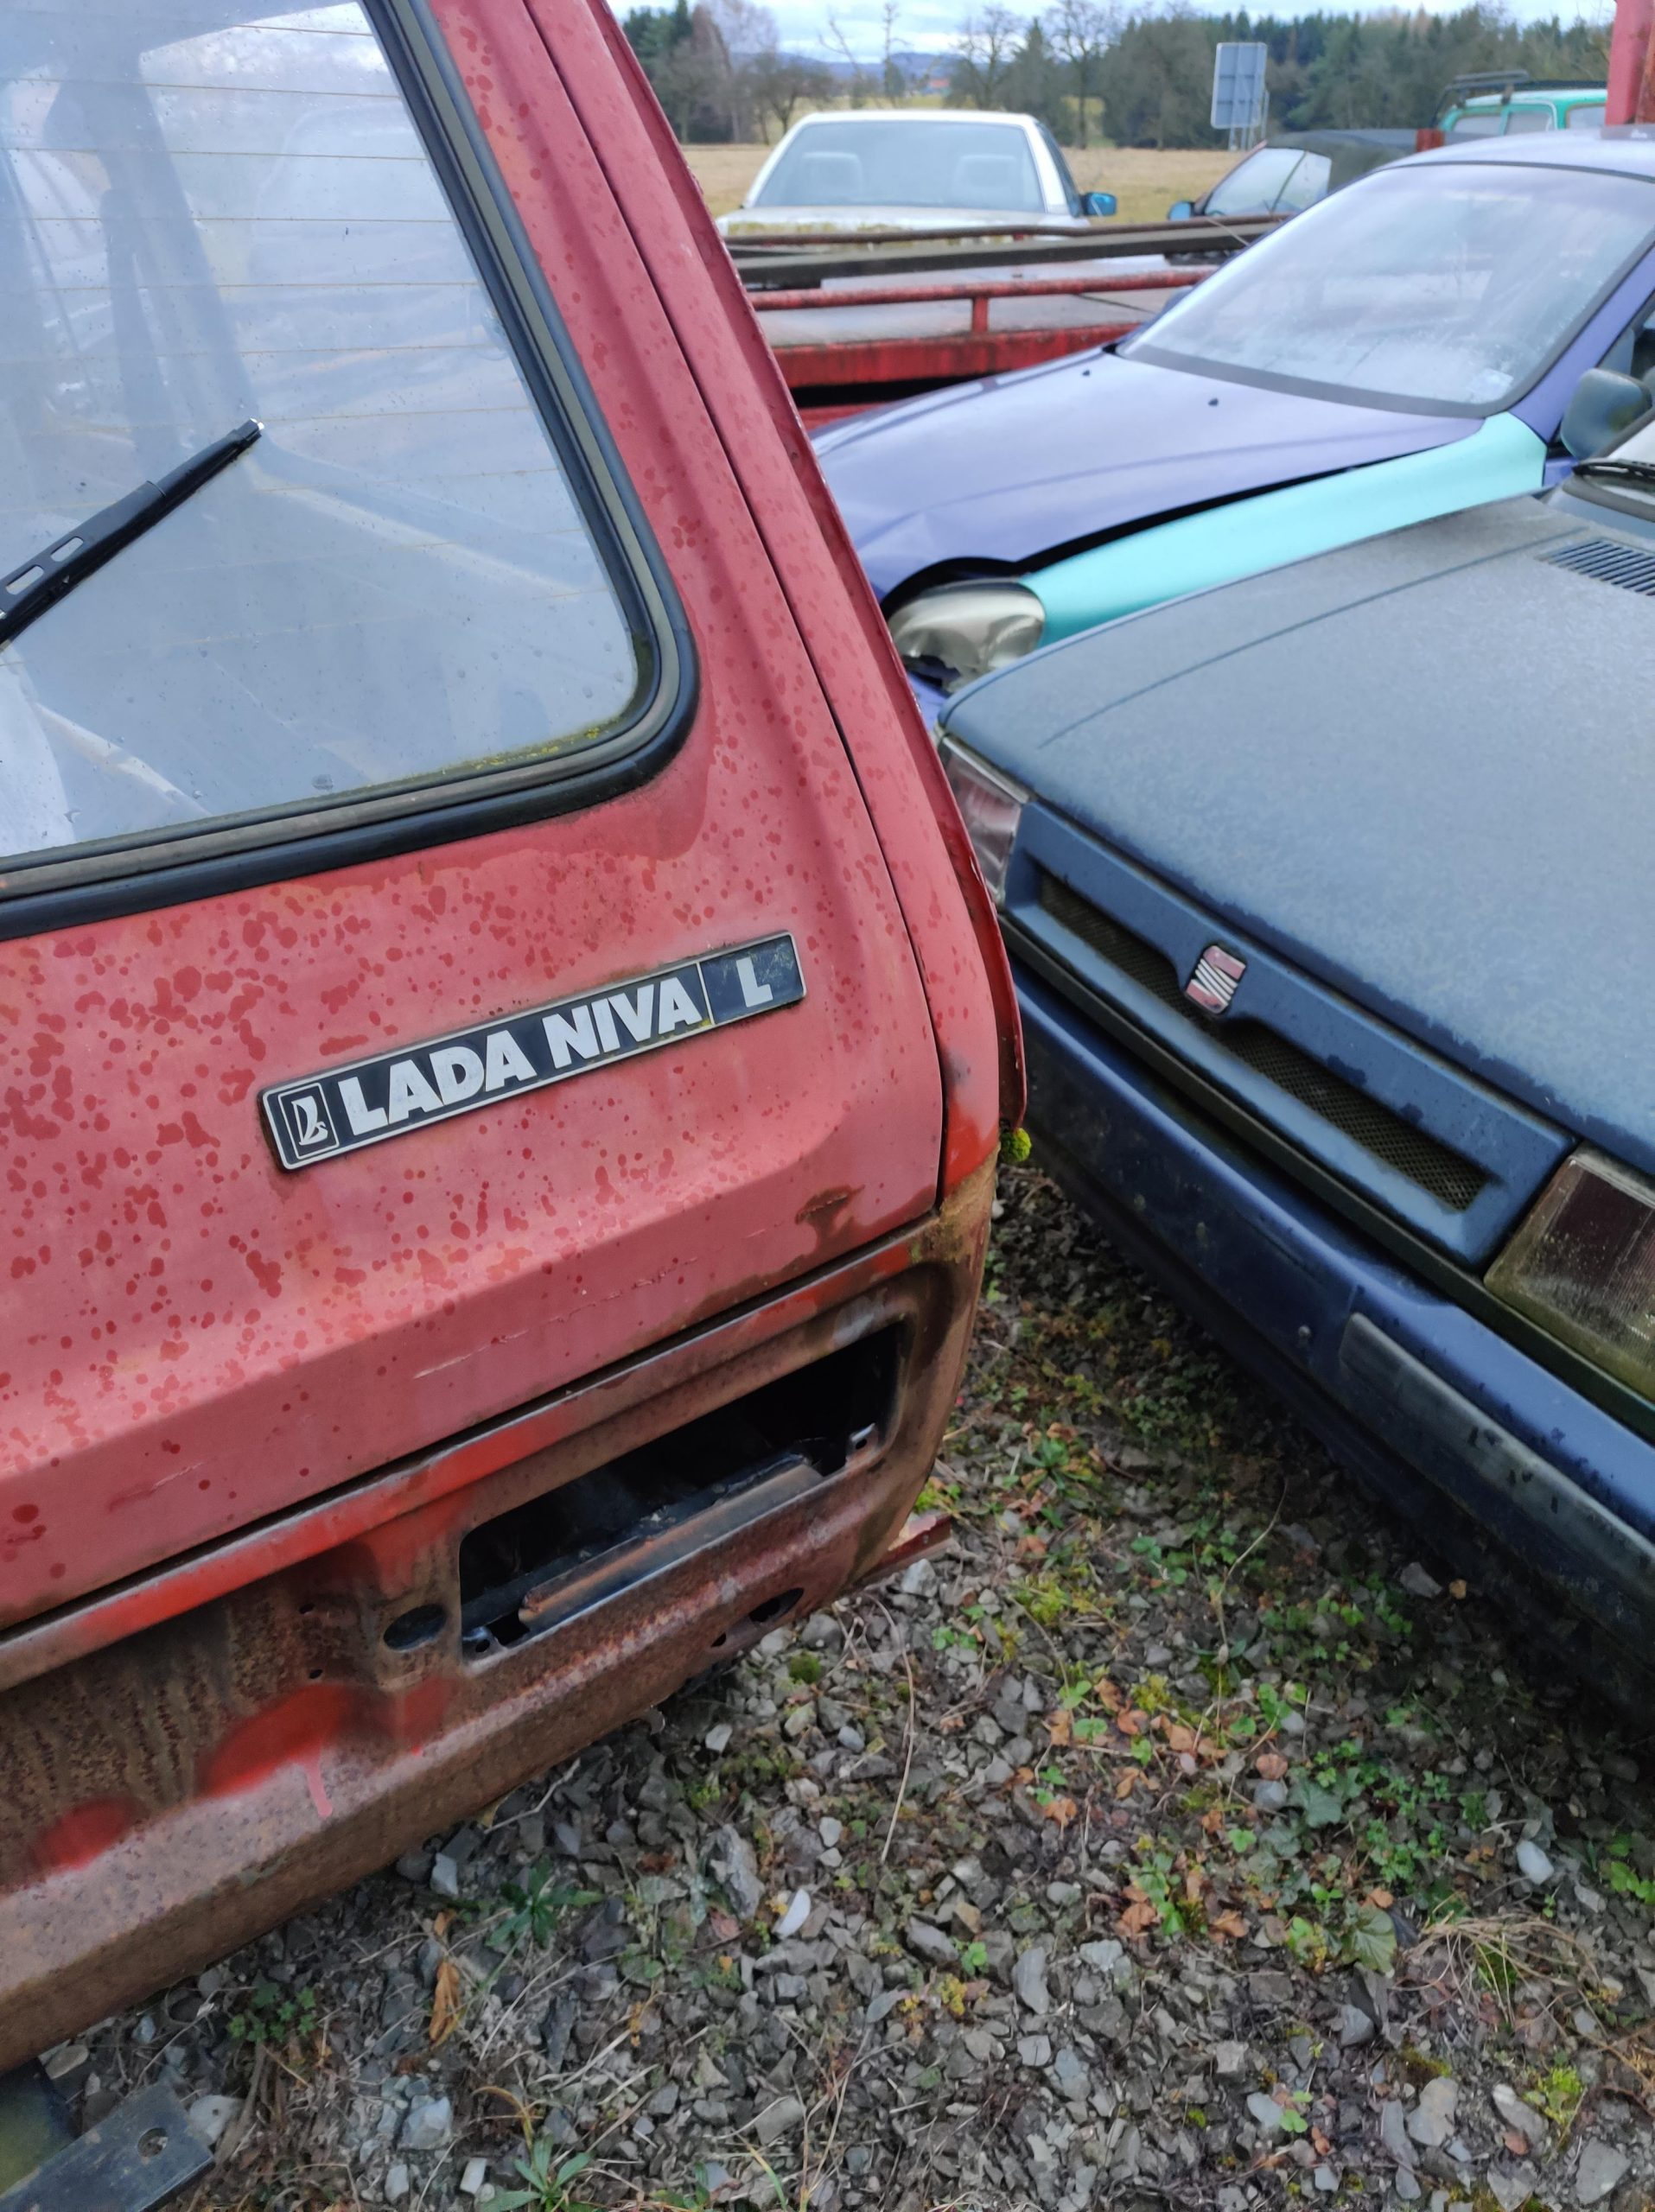 lada niva l red trunk